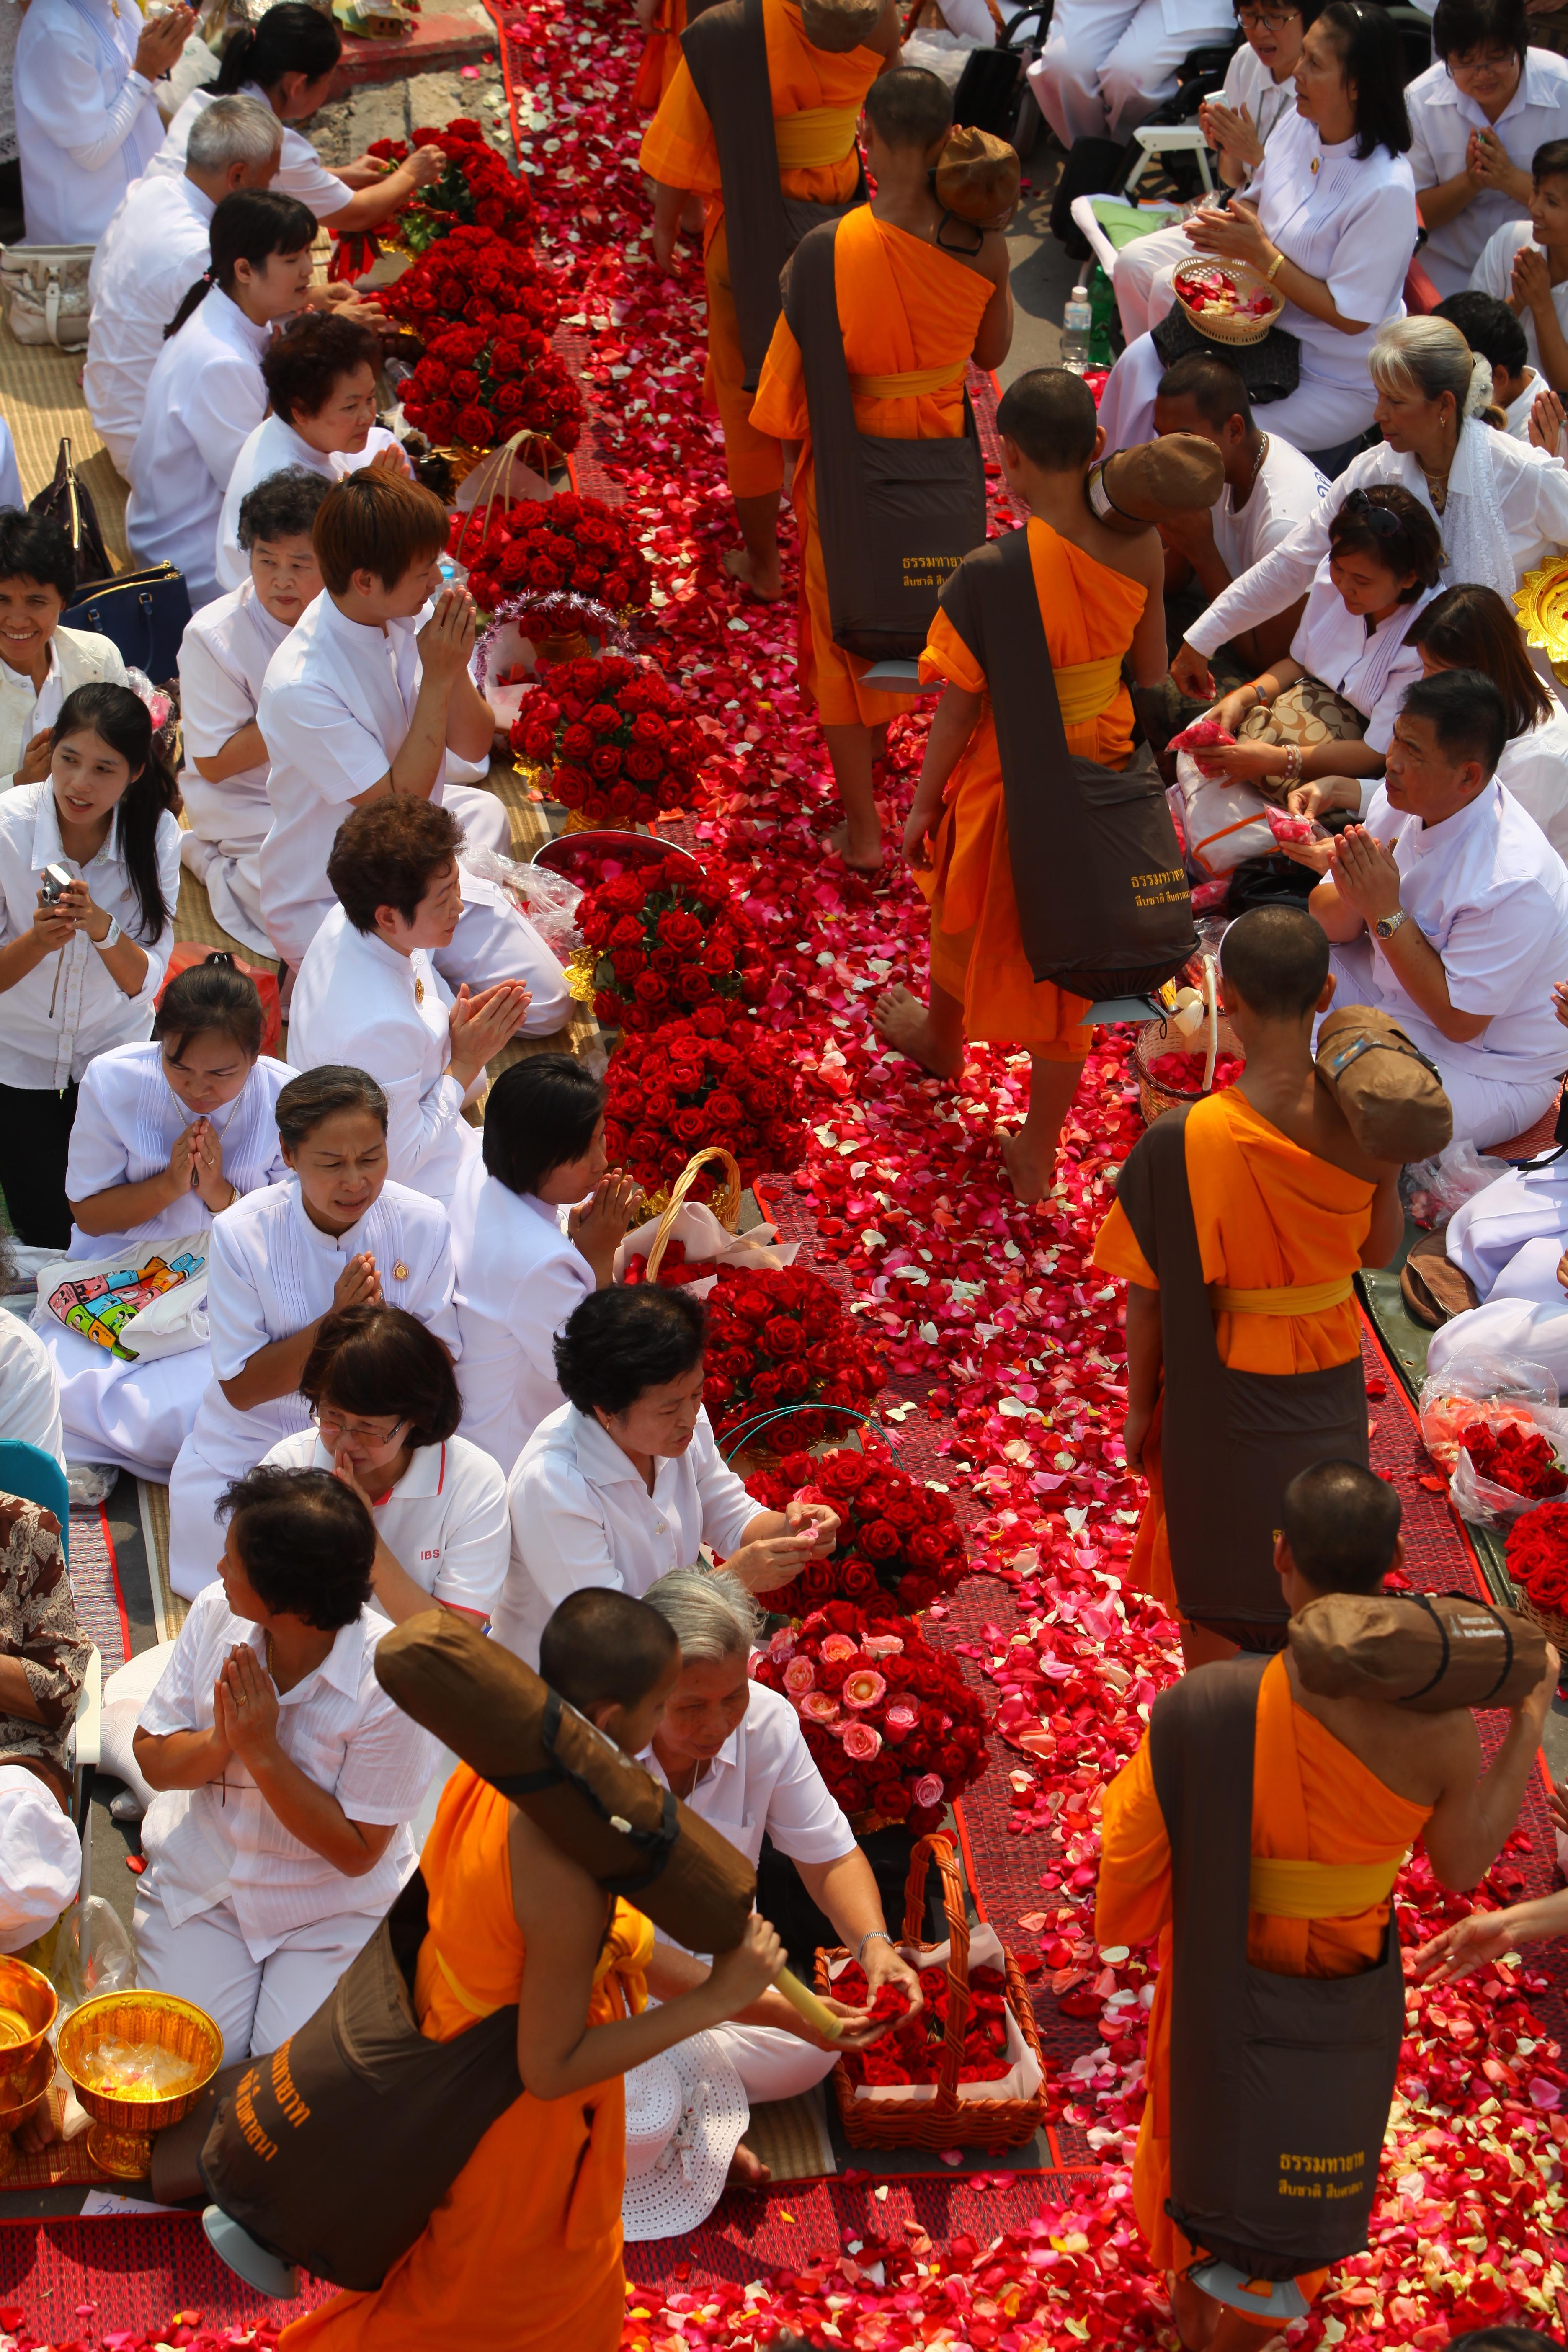 Free Images People City Crowd Walk Orange Buddhism Market